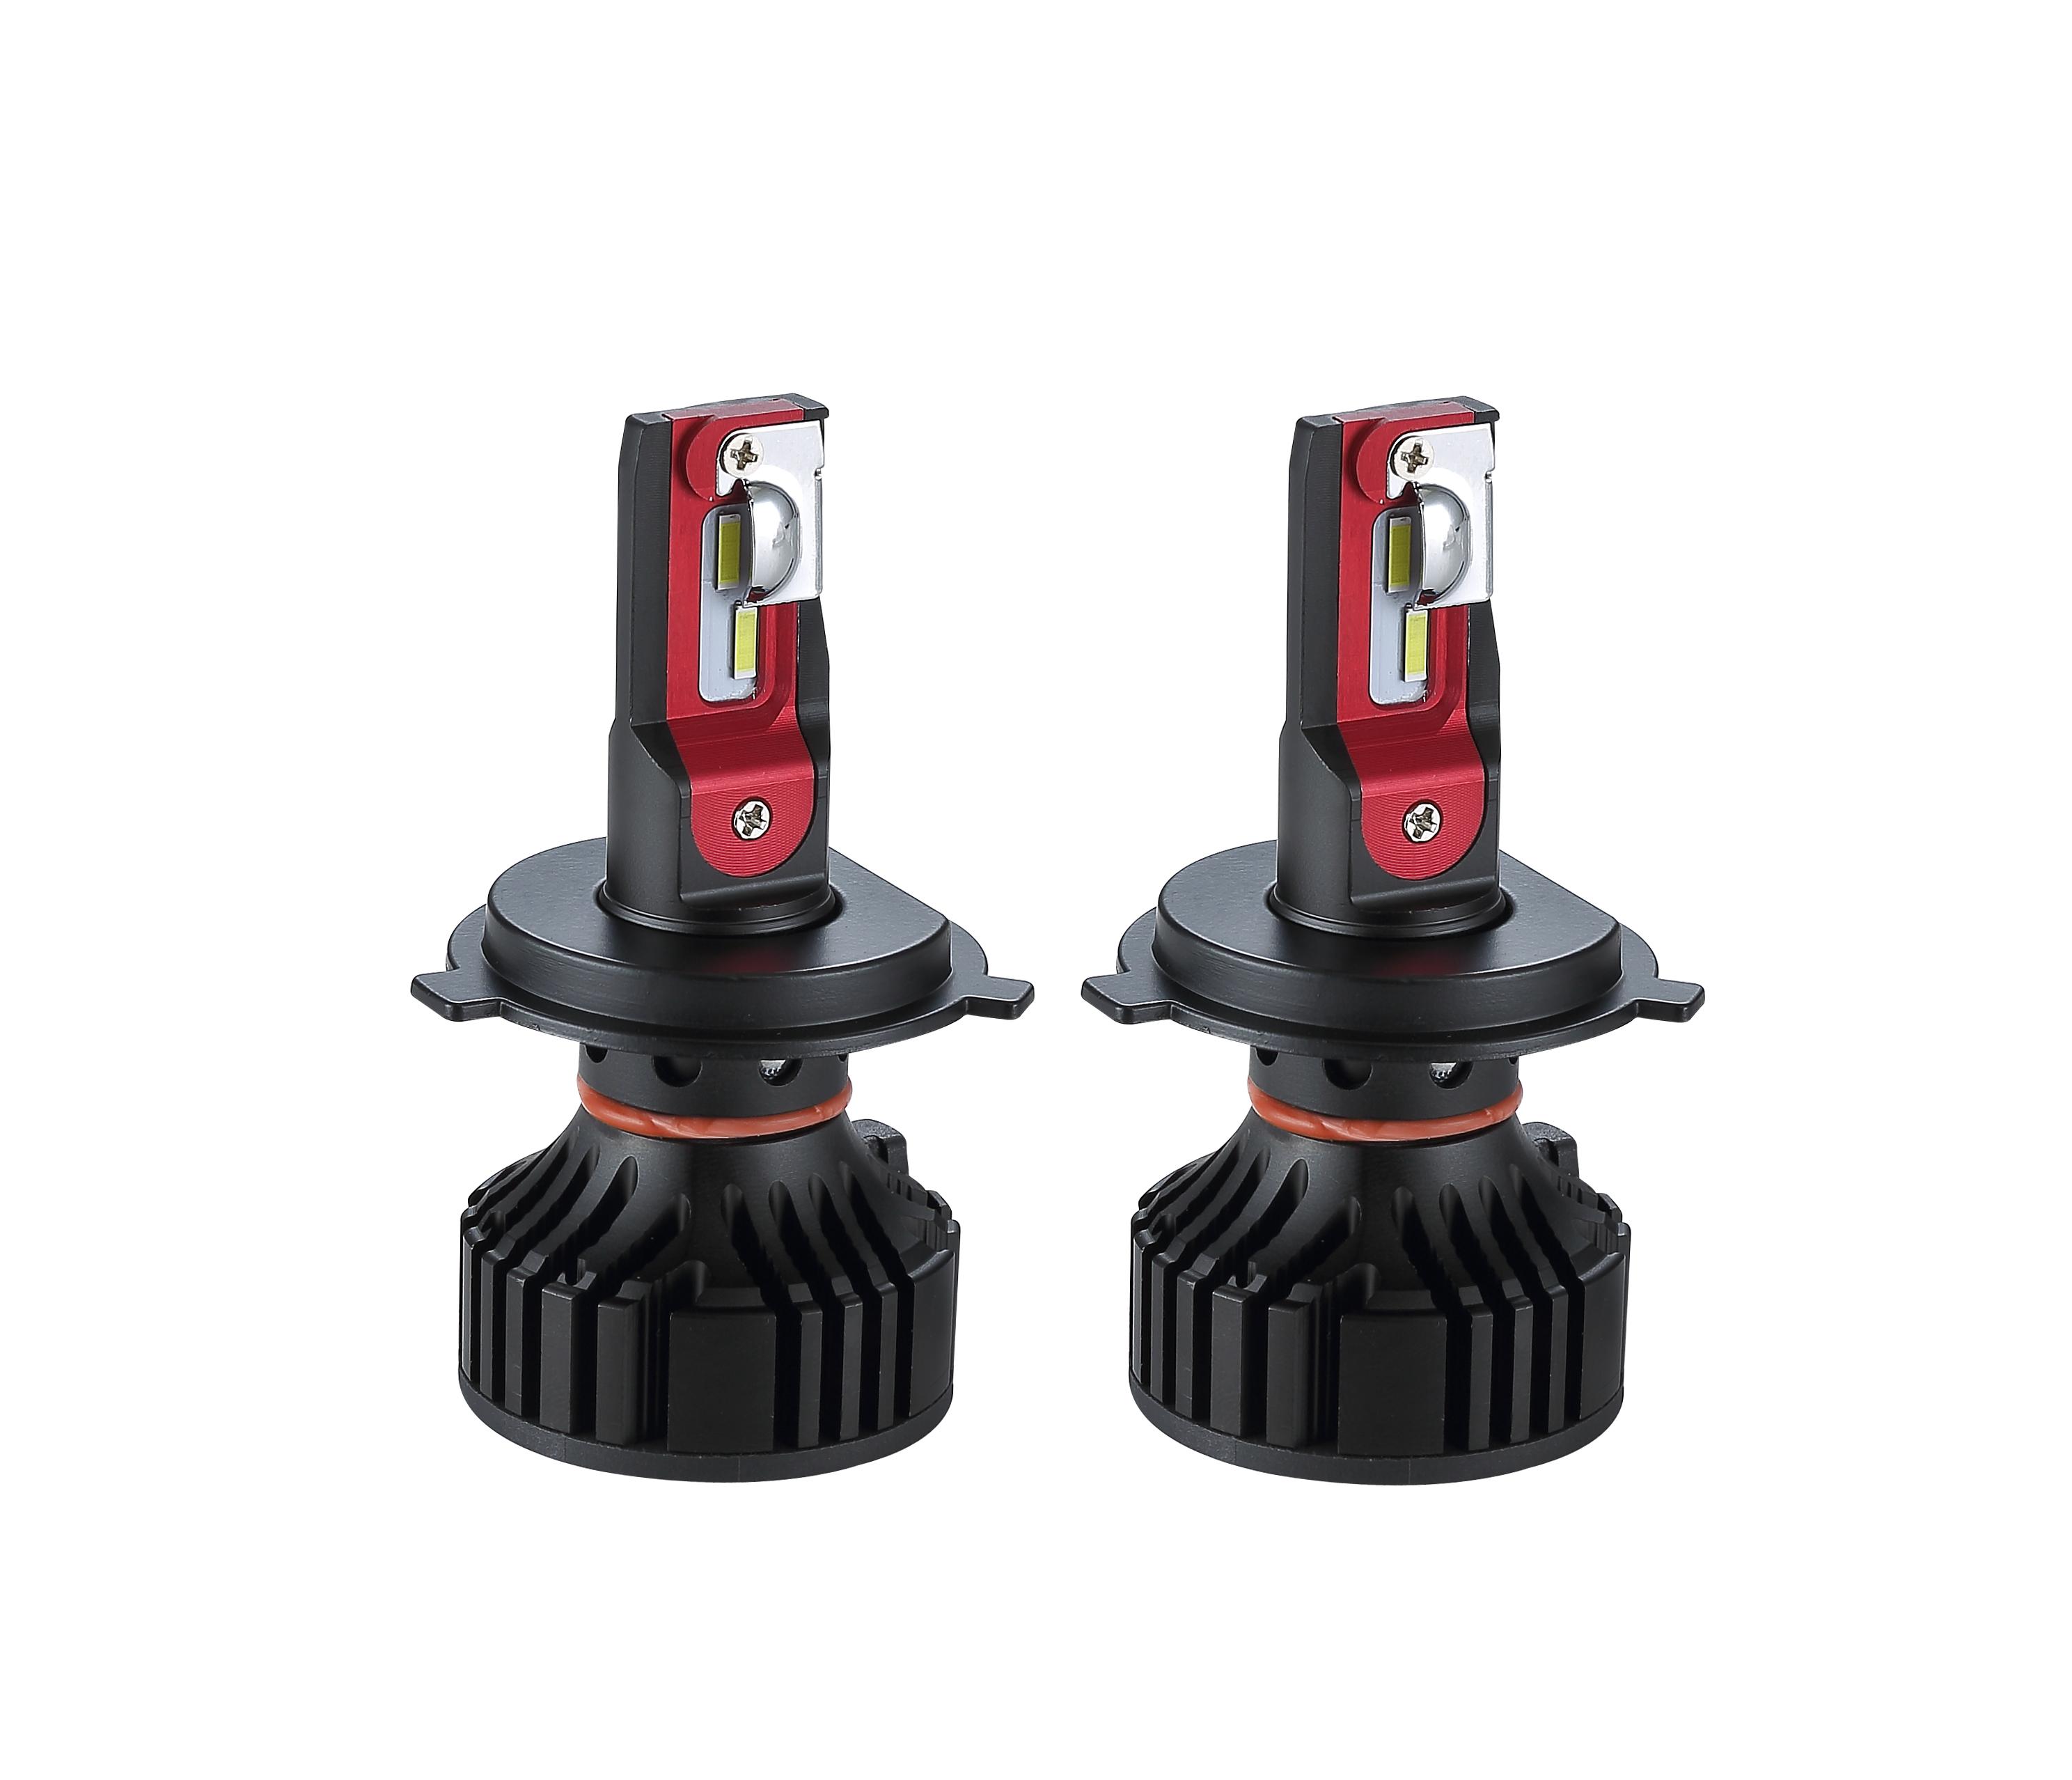 F2 H4-F2 Plus LED Headlight